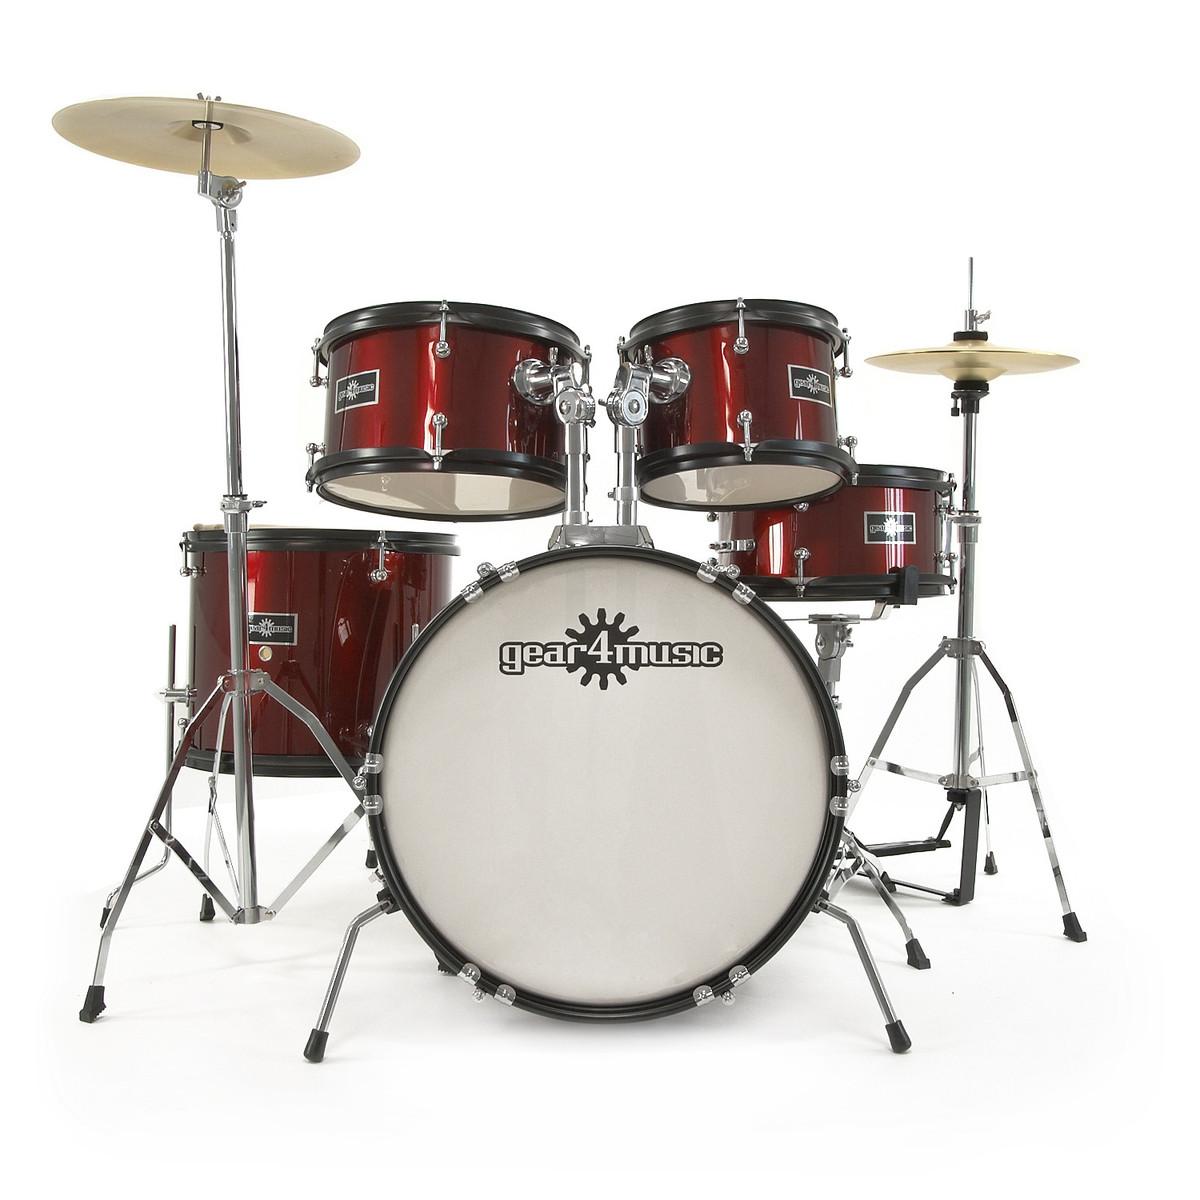 Junior 5 Piece Drum Kit By Gear4music Wine Red B Stock